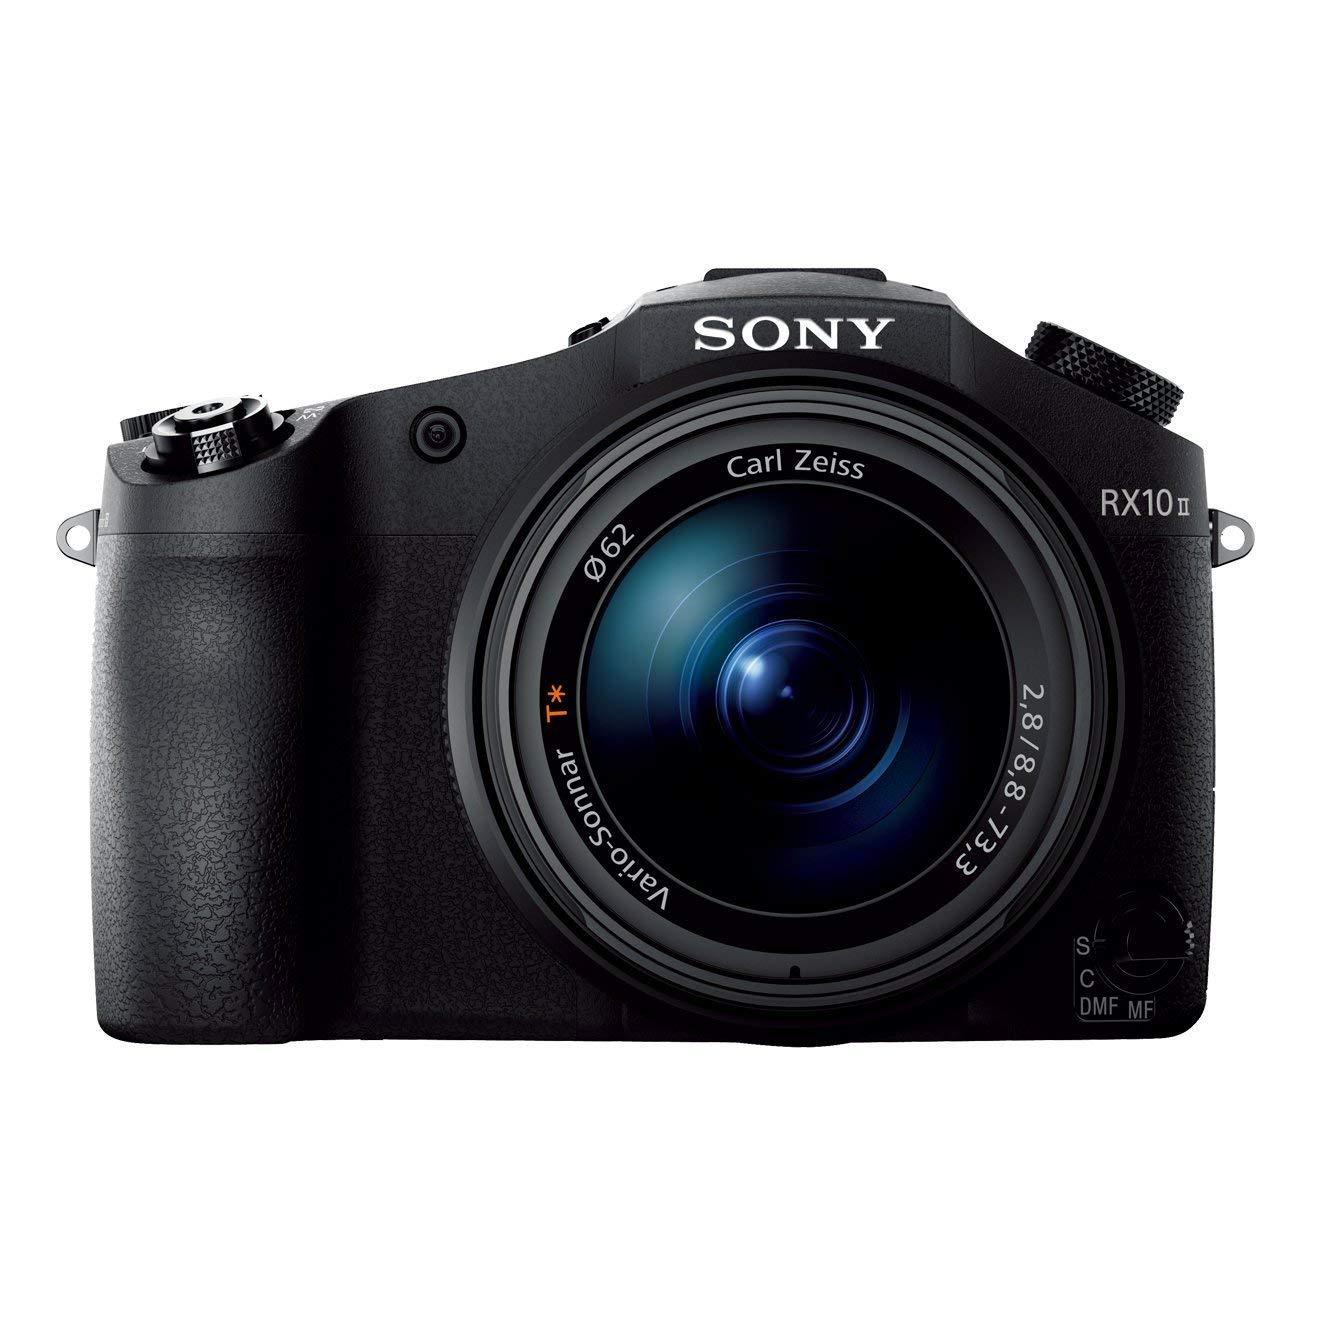 Sony Cyber-shot DSC-RX10 II schwarz (DSC-RX10M2) Bridgekamera [Amazon] PVG: 953,50 - 100€ Cashback möglich